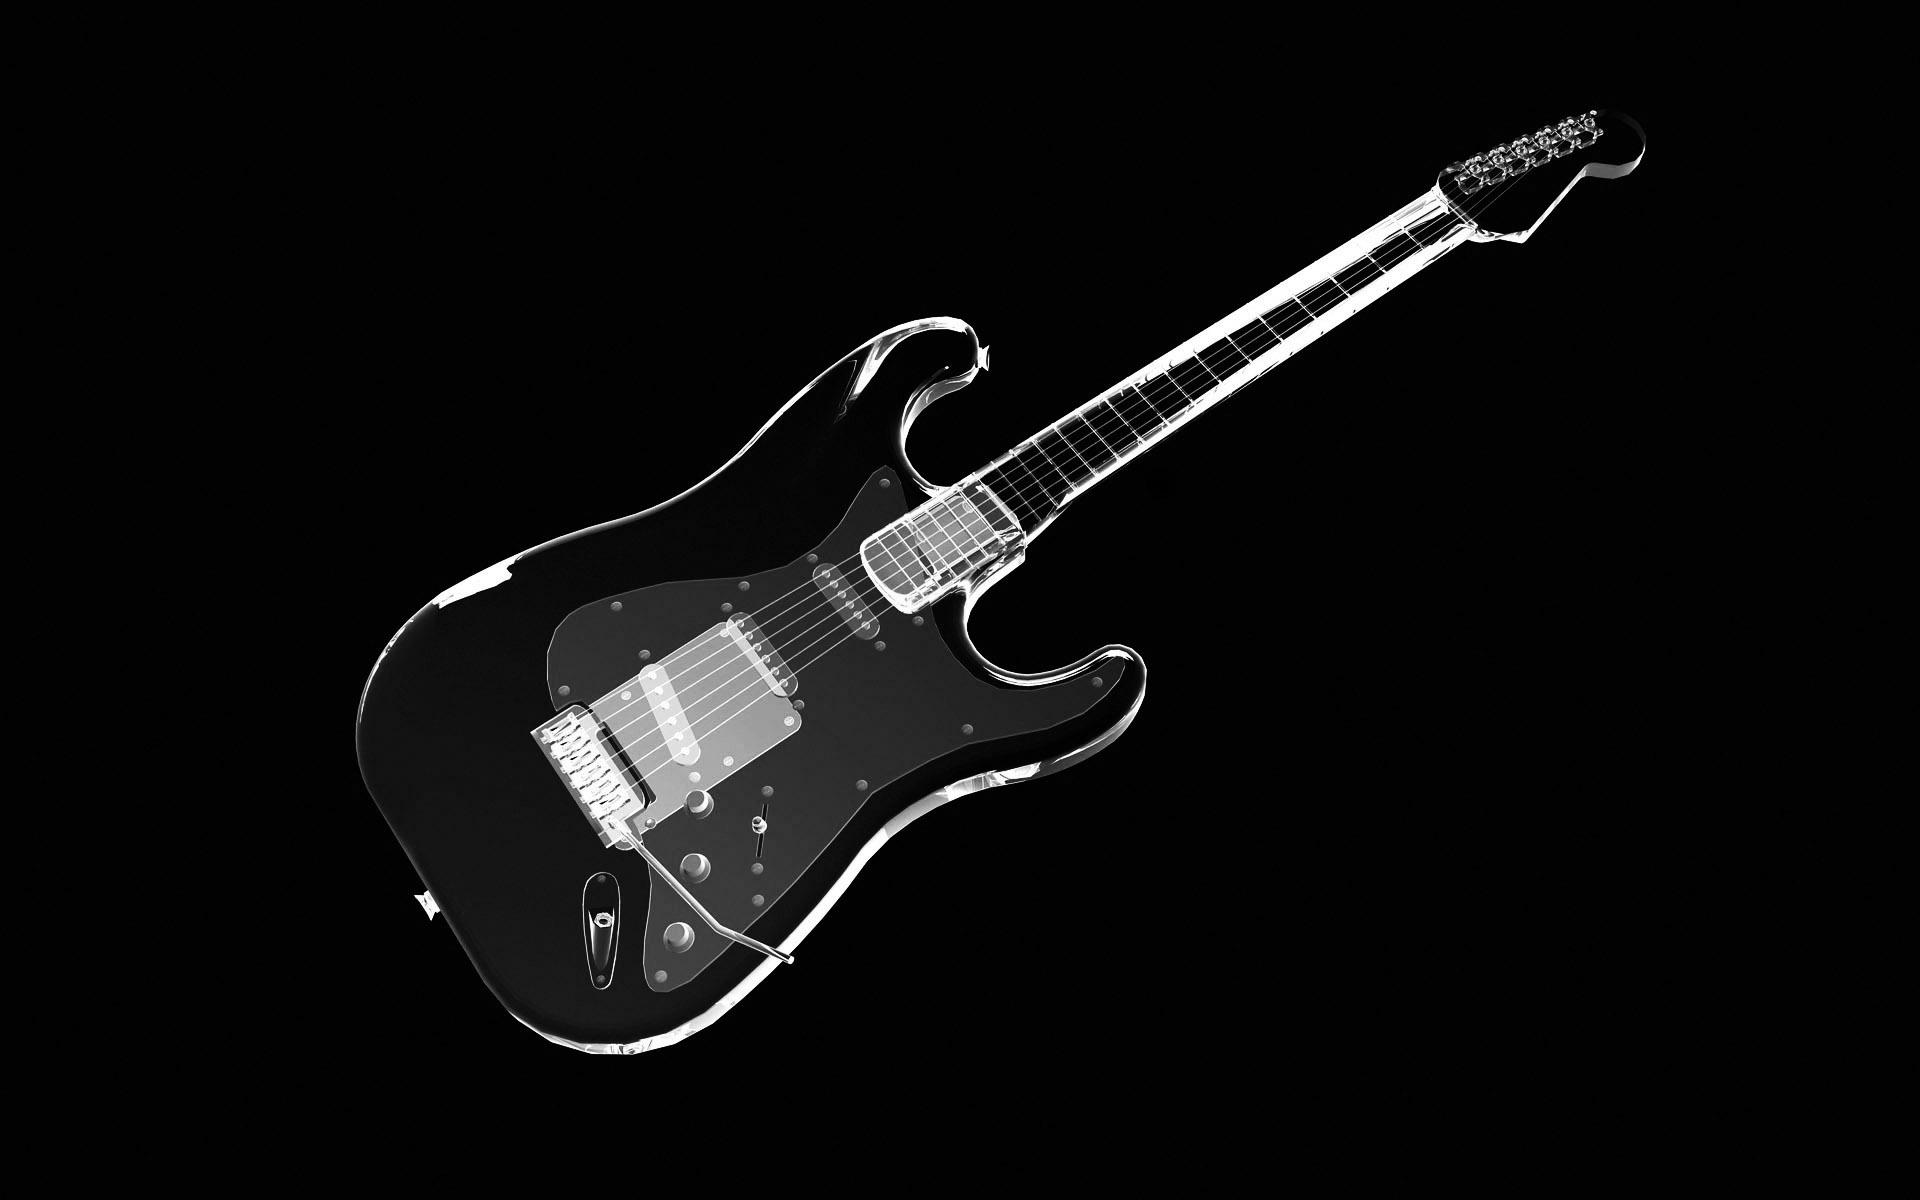 Desktop Wallpapers Black Violin High Definition 1920x1200